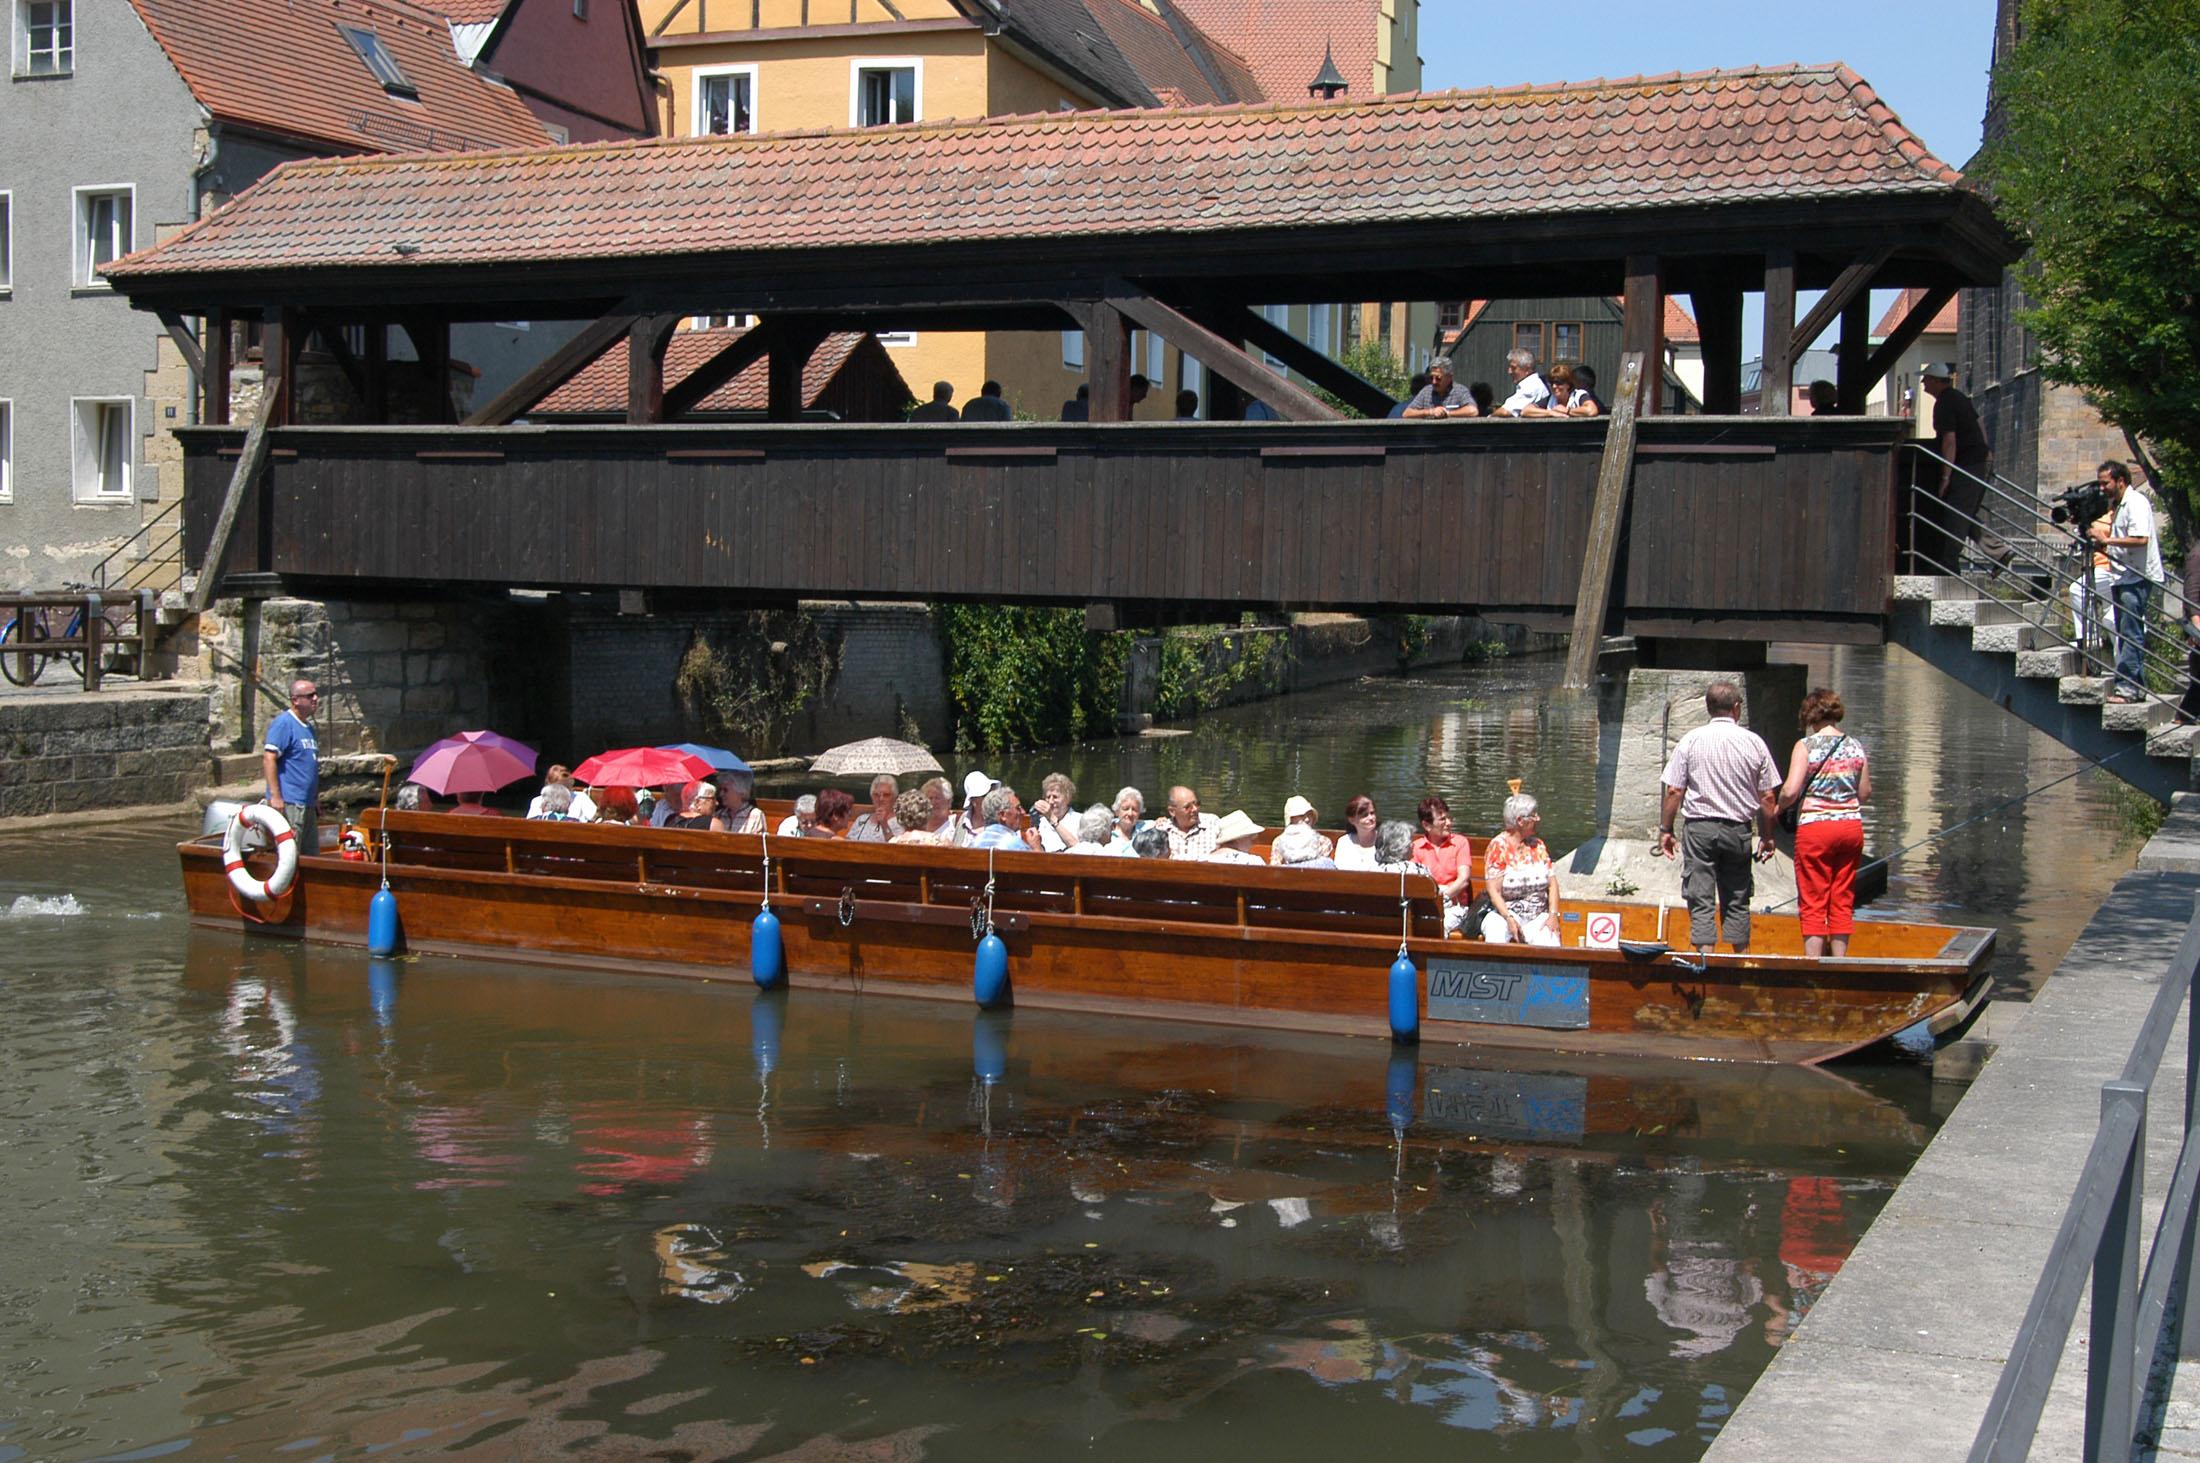 Enjoy a flat boat ride on the Vils, the earlier lifeline of Amberg in ancient days - Pättenfahrt auf der Vils